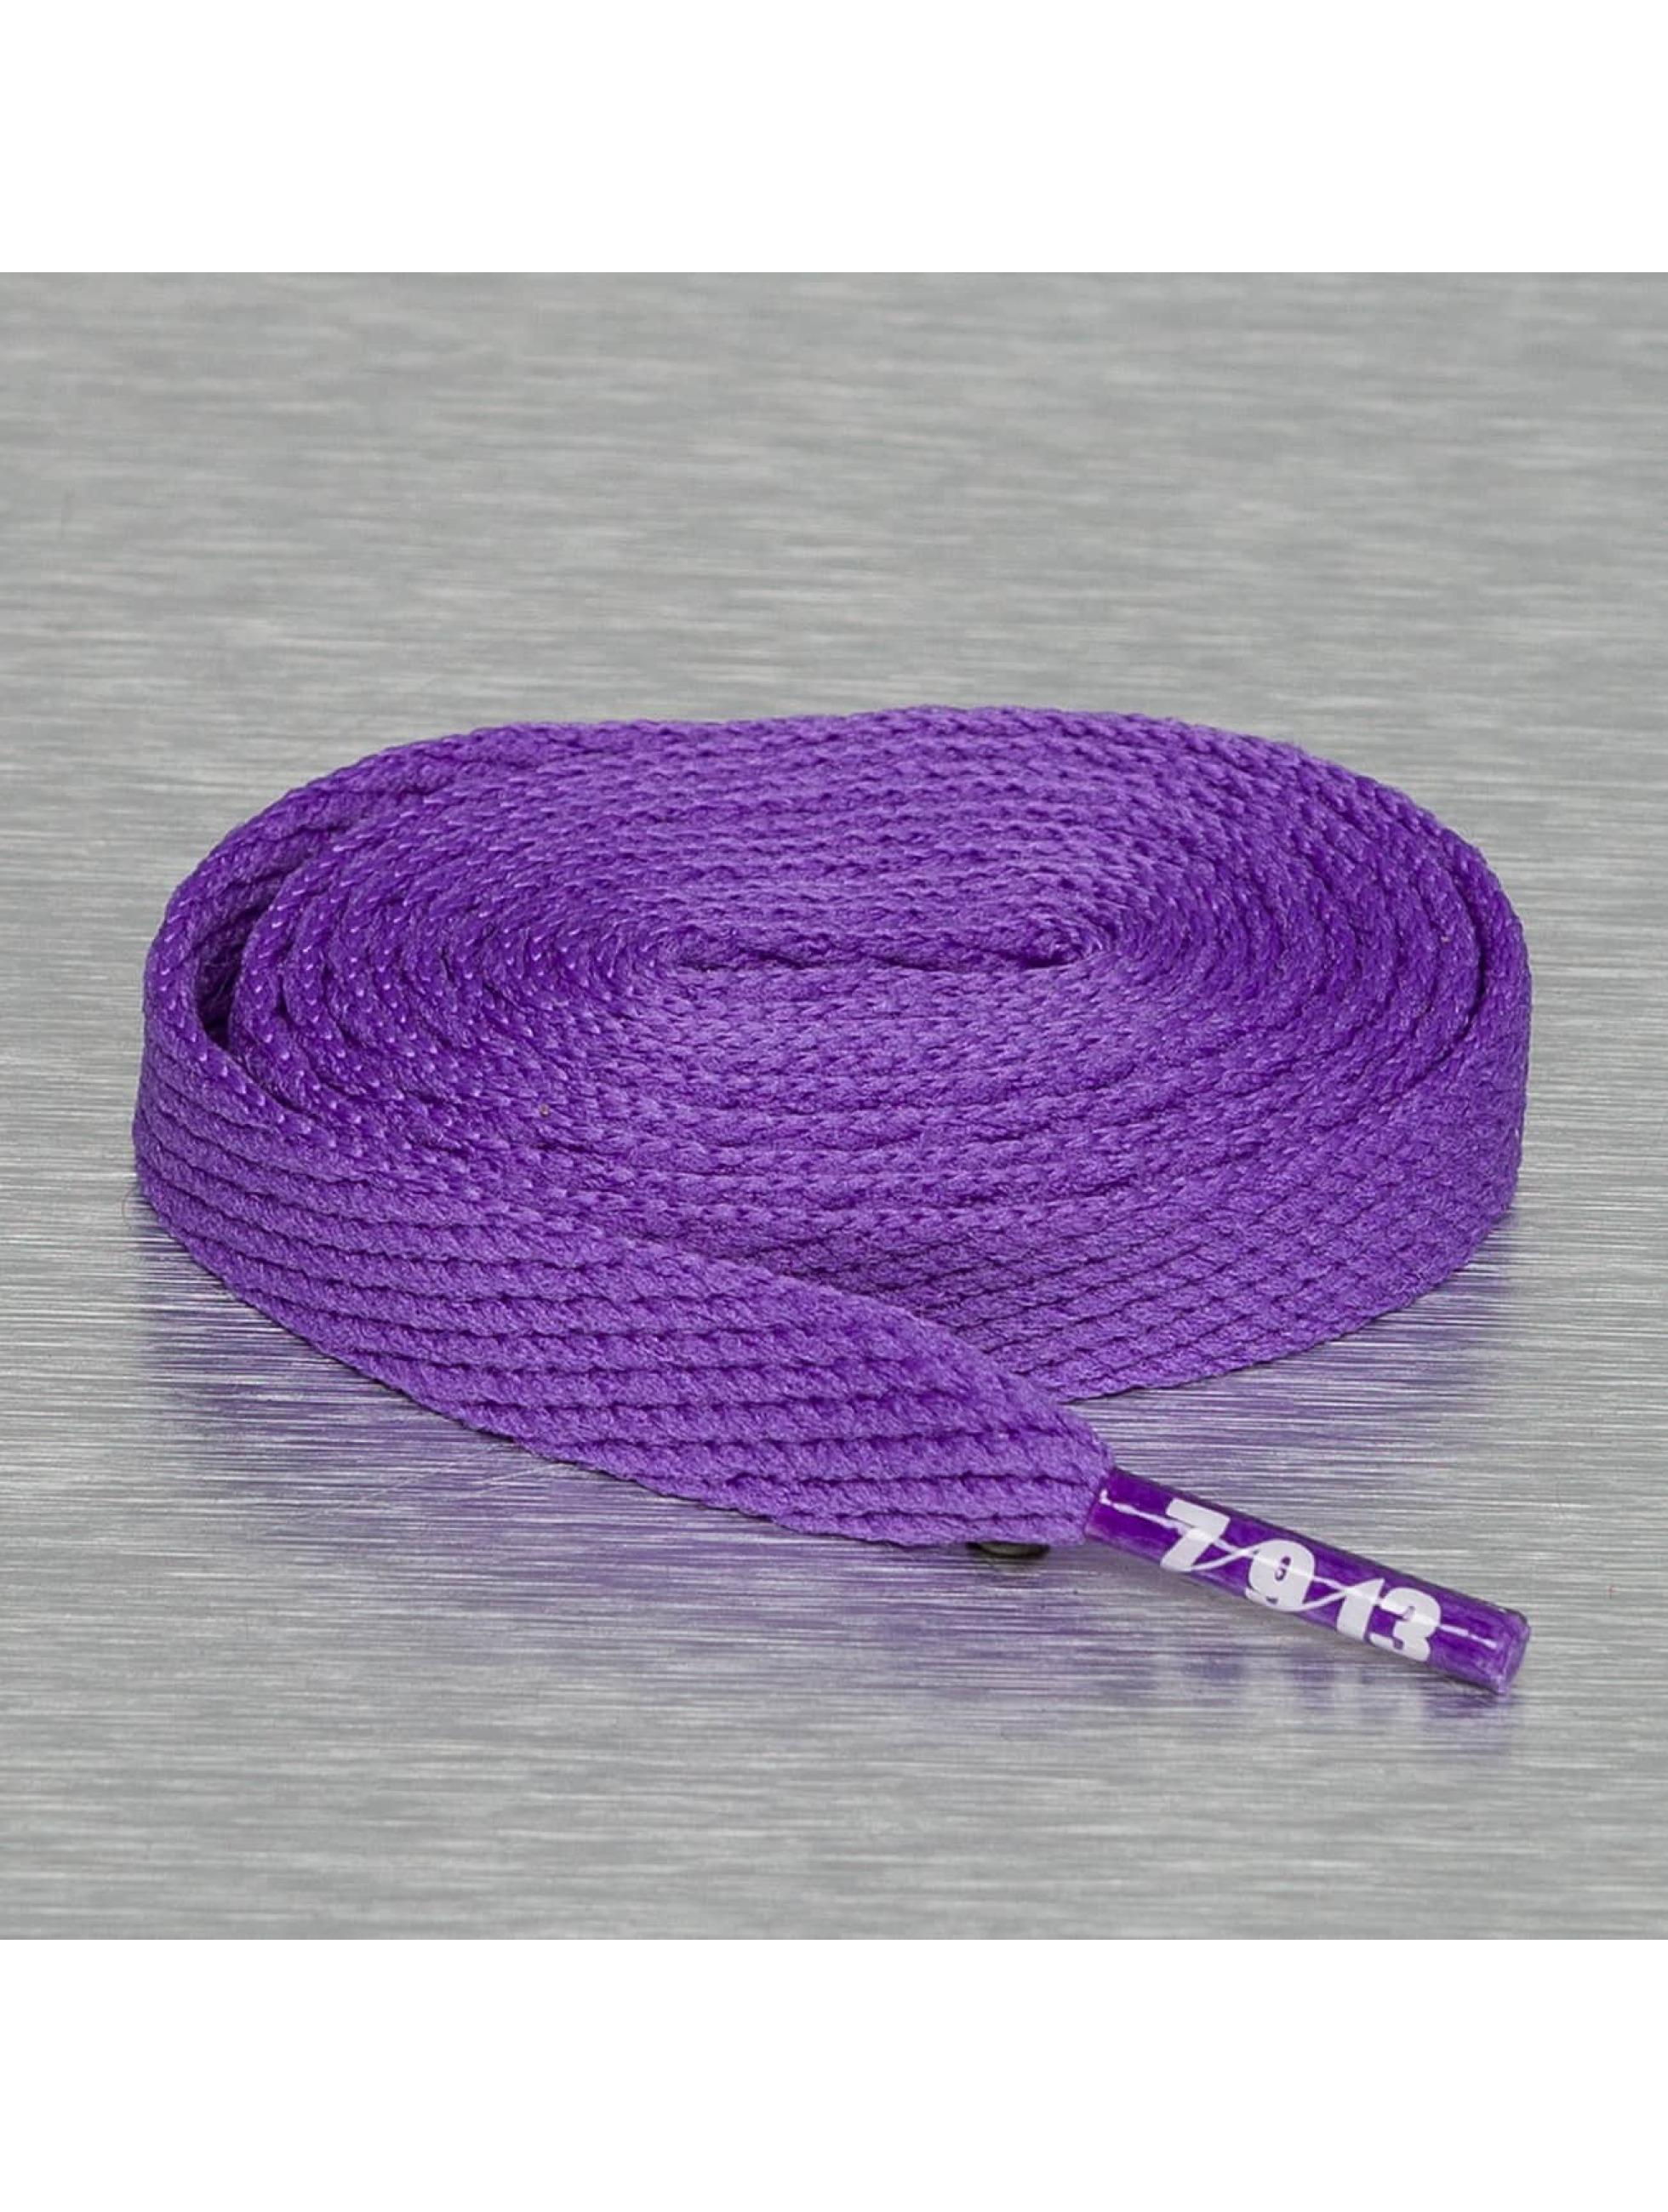 Seven Nine 13 Männer,Frauen Schuhzubehör Hard Candy Flat in violet